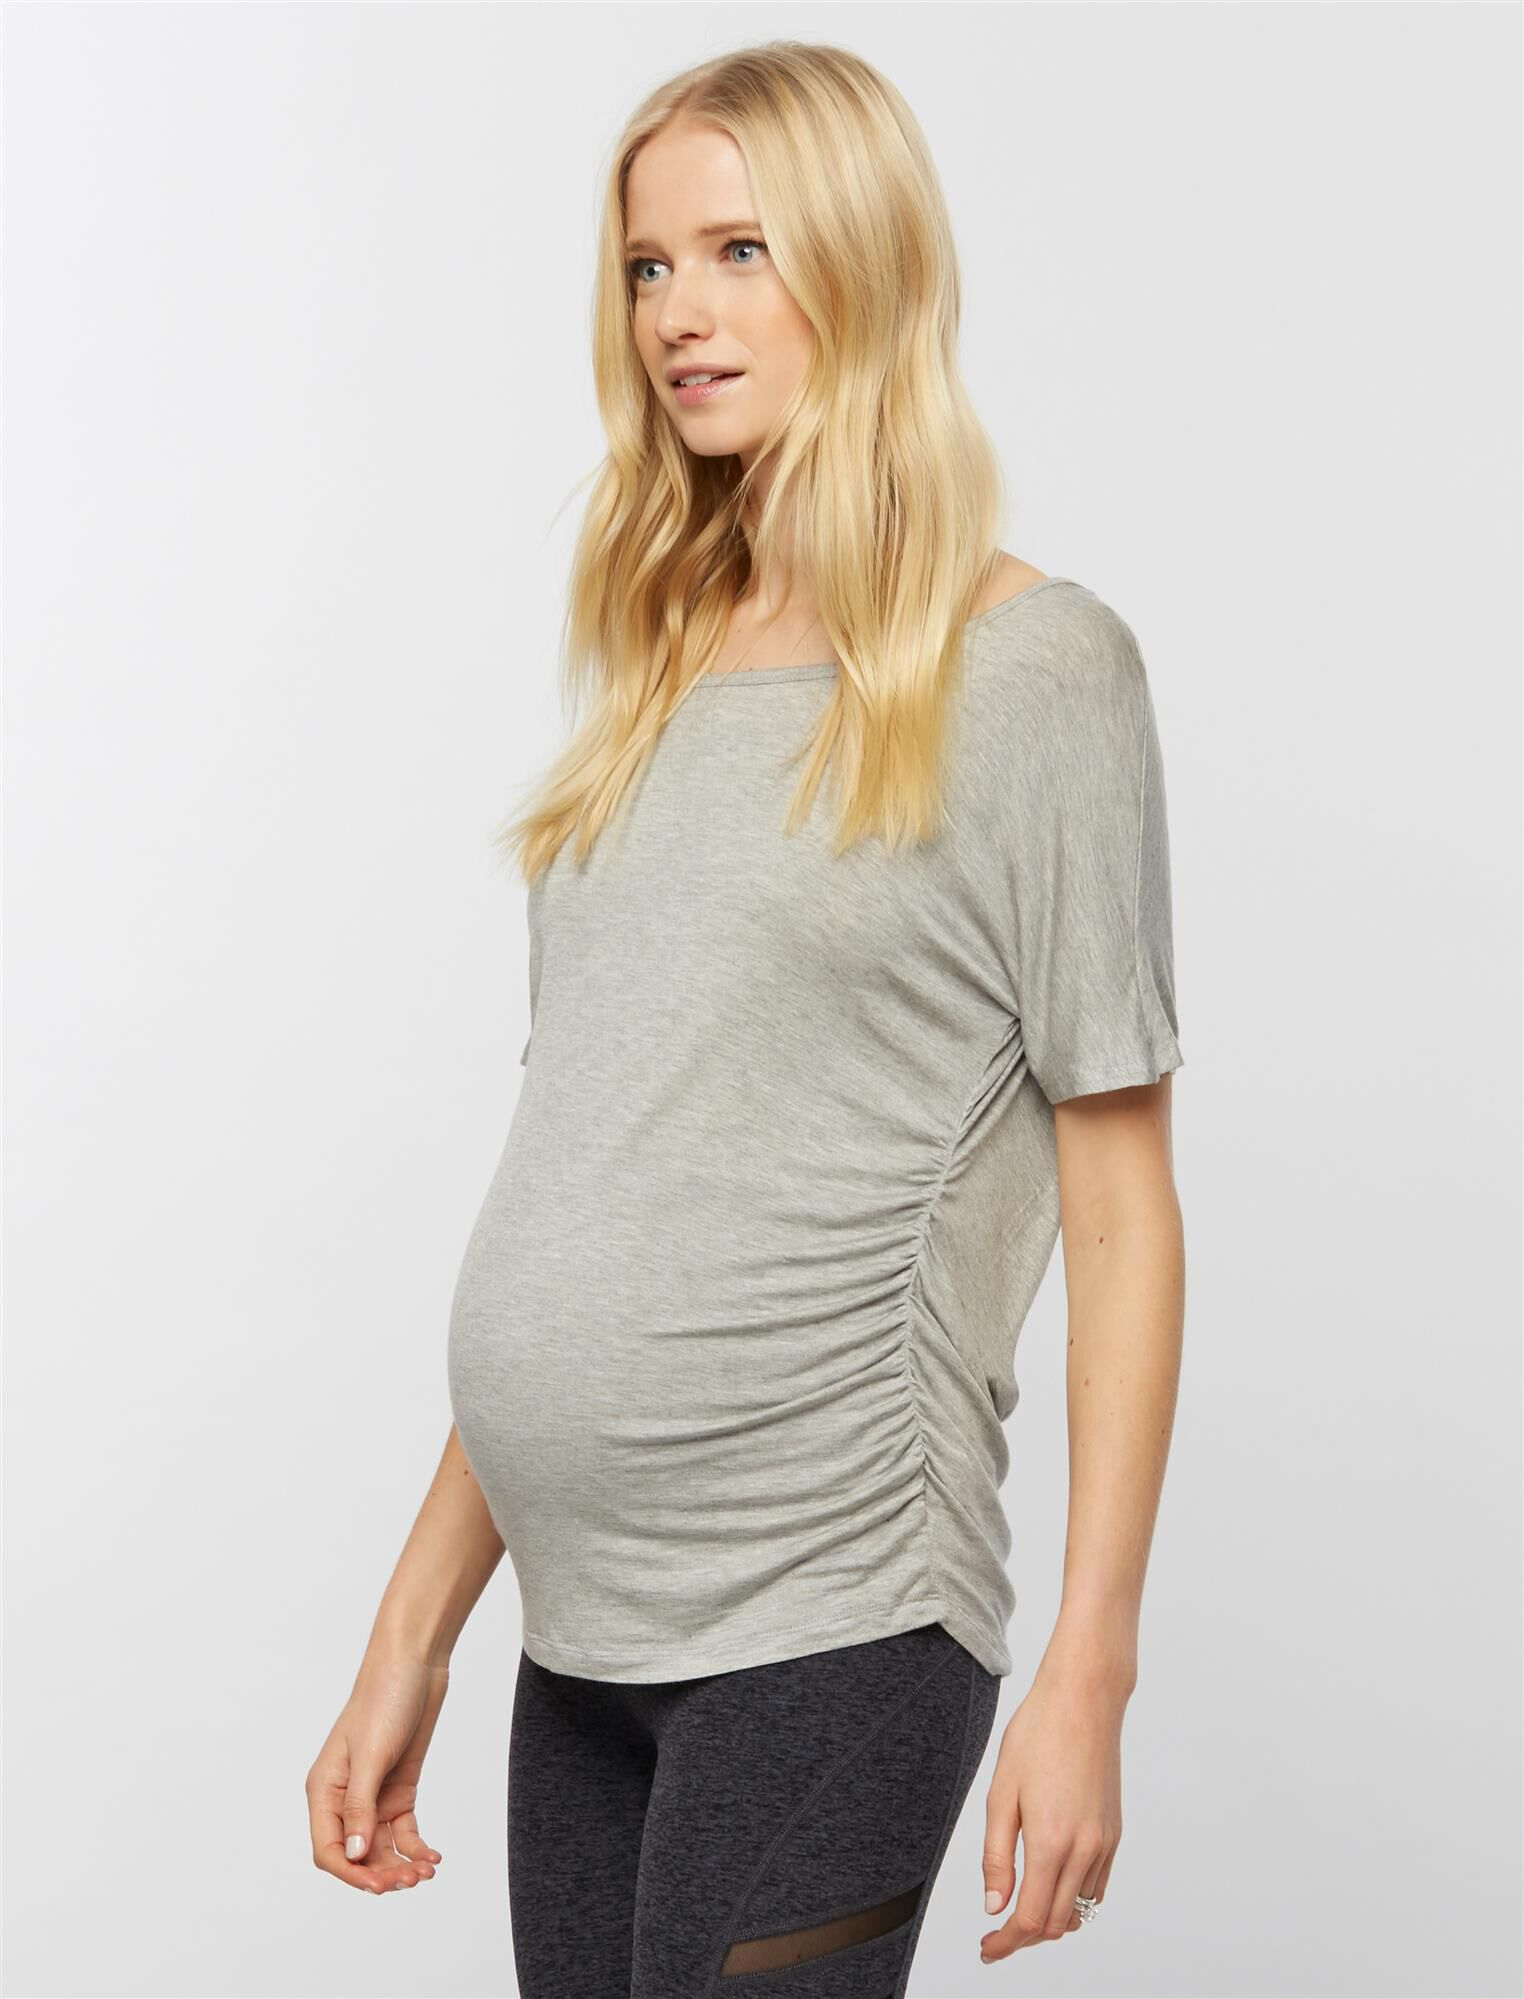 Beyond The Bump Dolman Sleeve Maternity Top